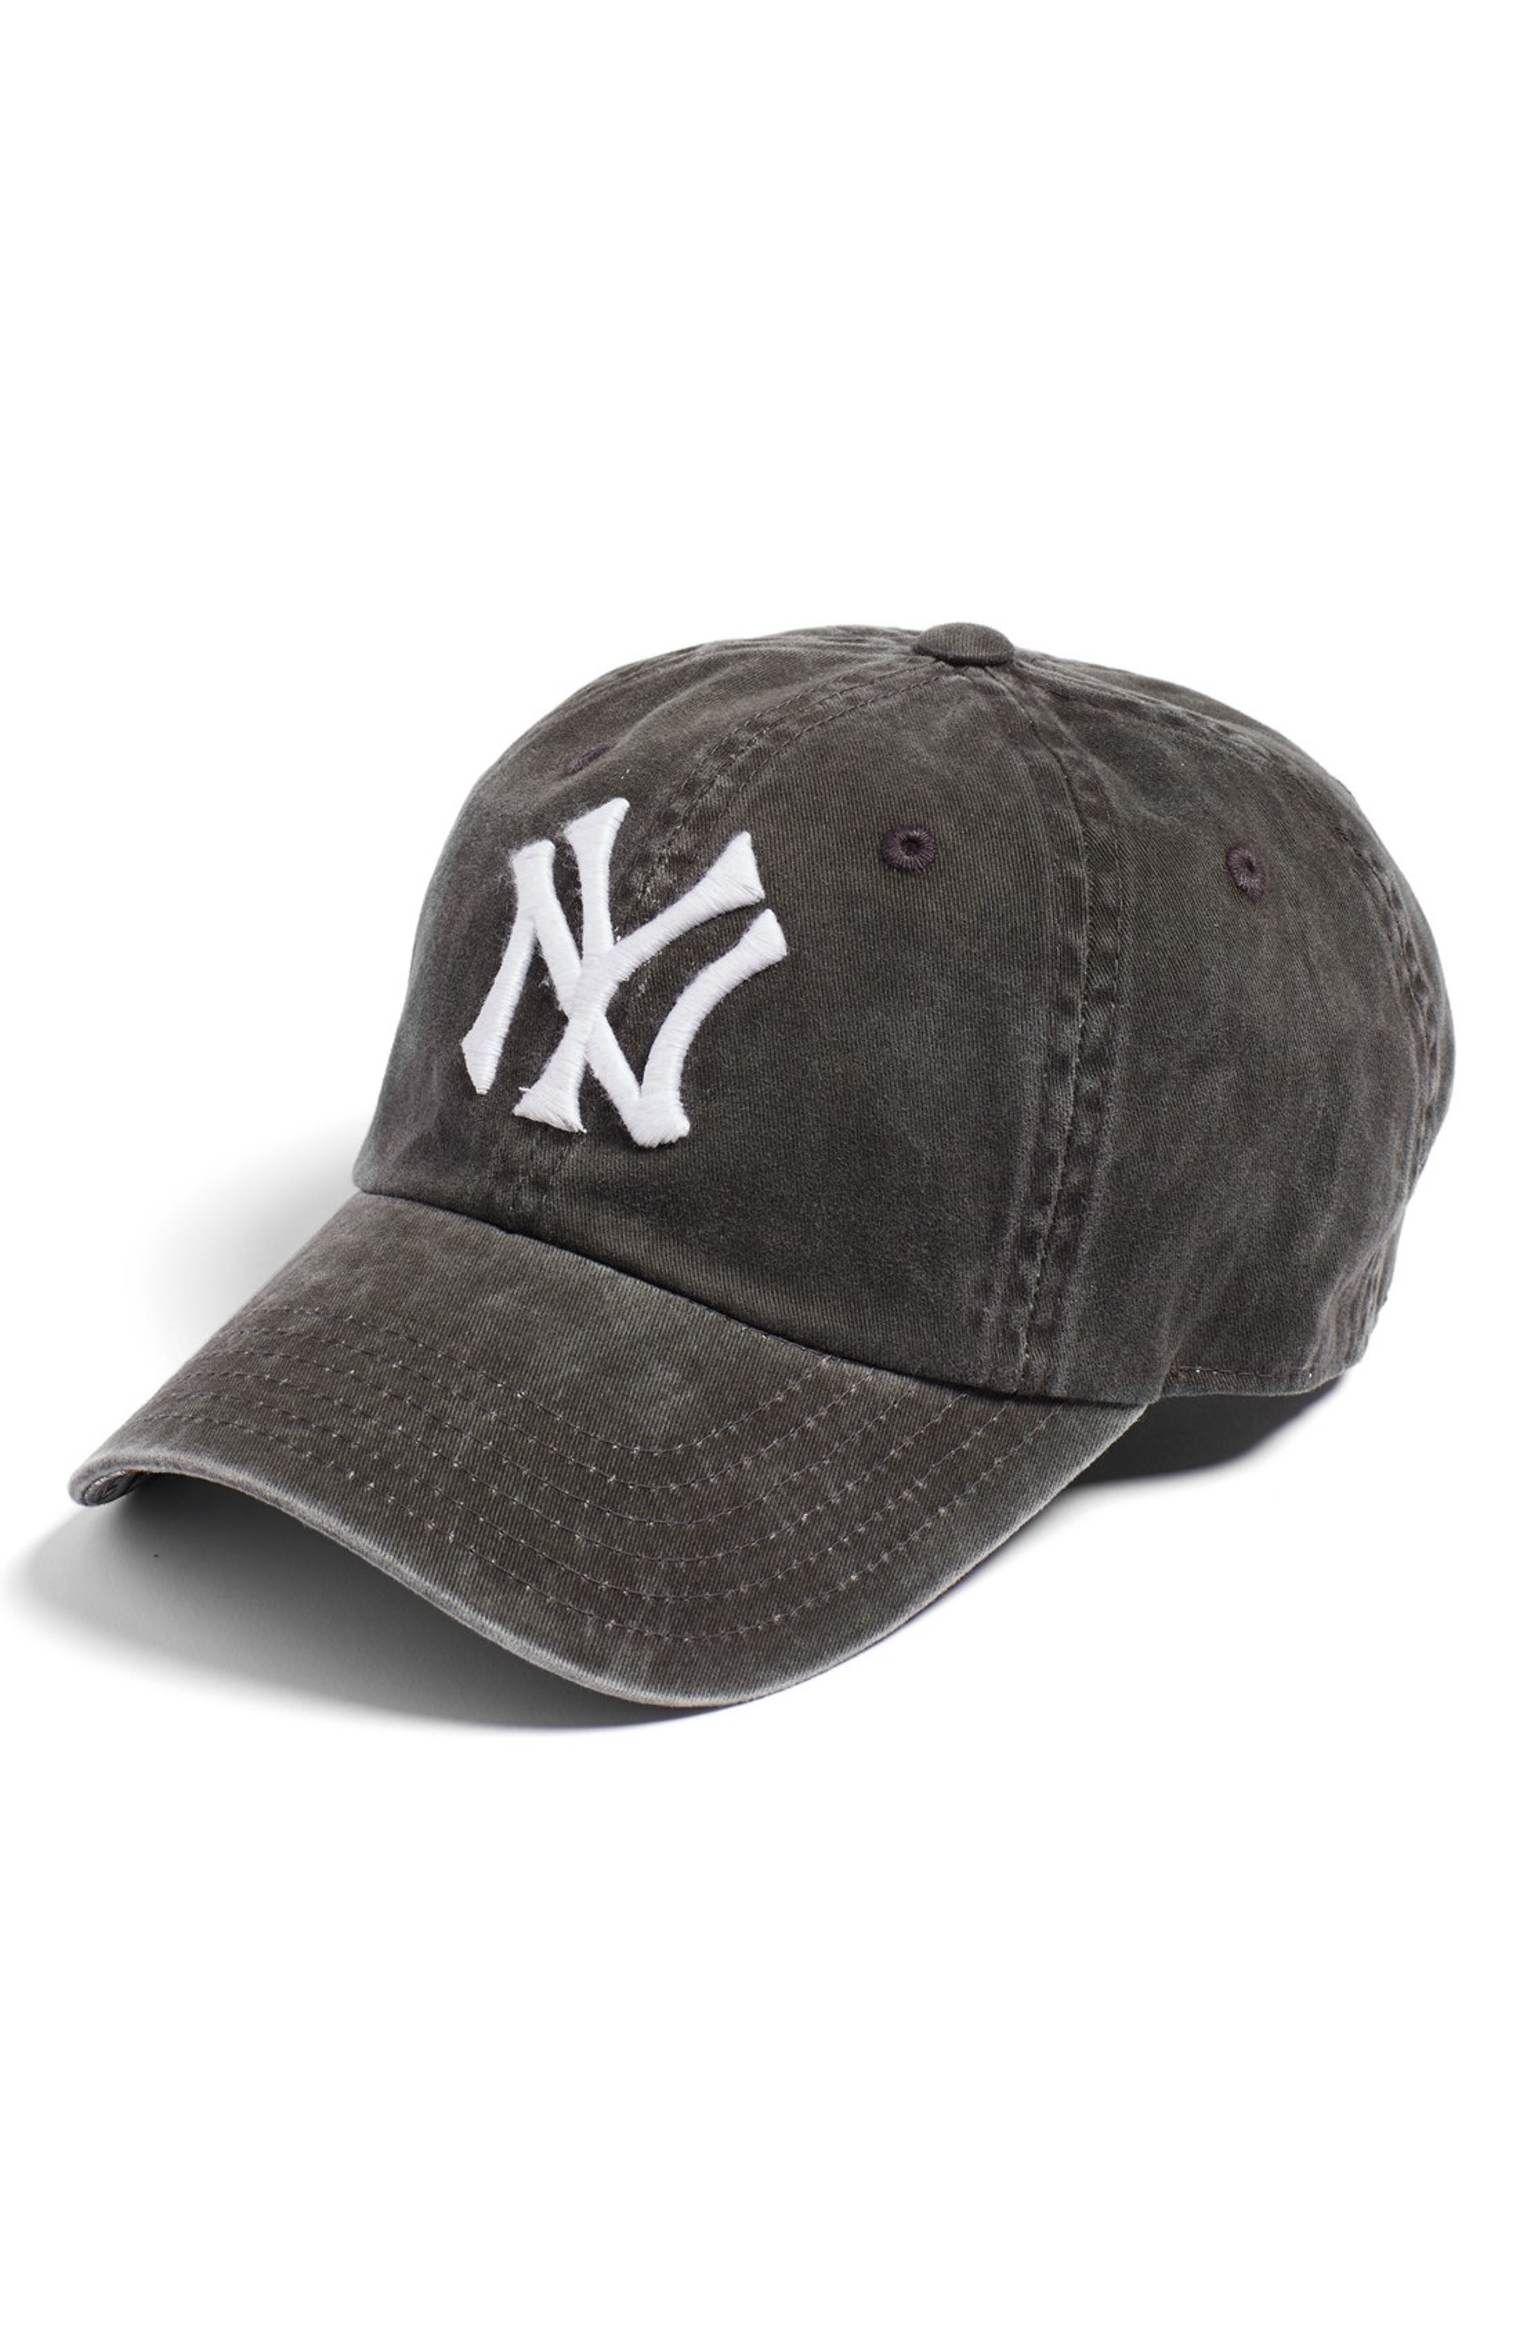 Main Image - American Needle  New Raglan - New York Yankees  Baseball Cap 0e3267777a3